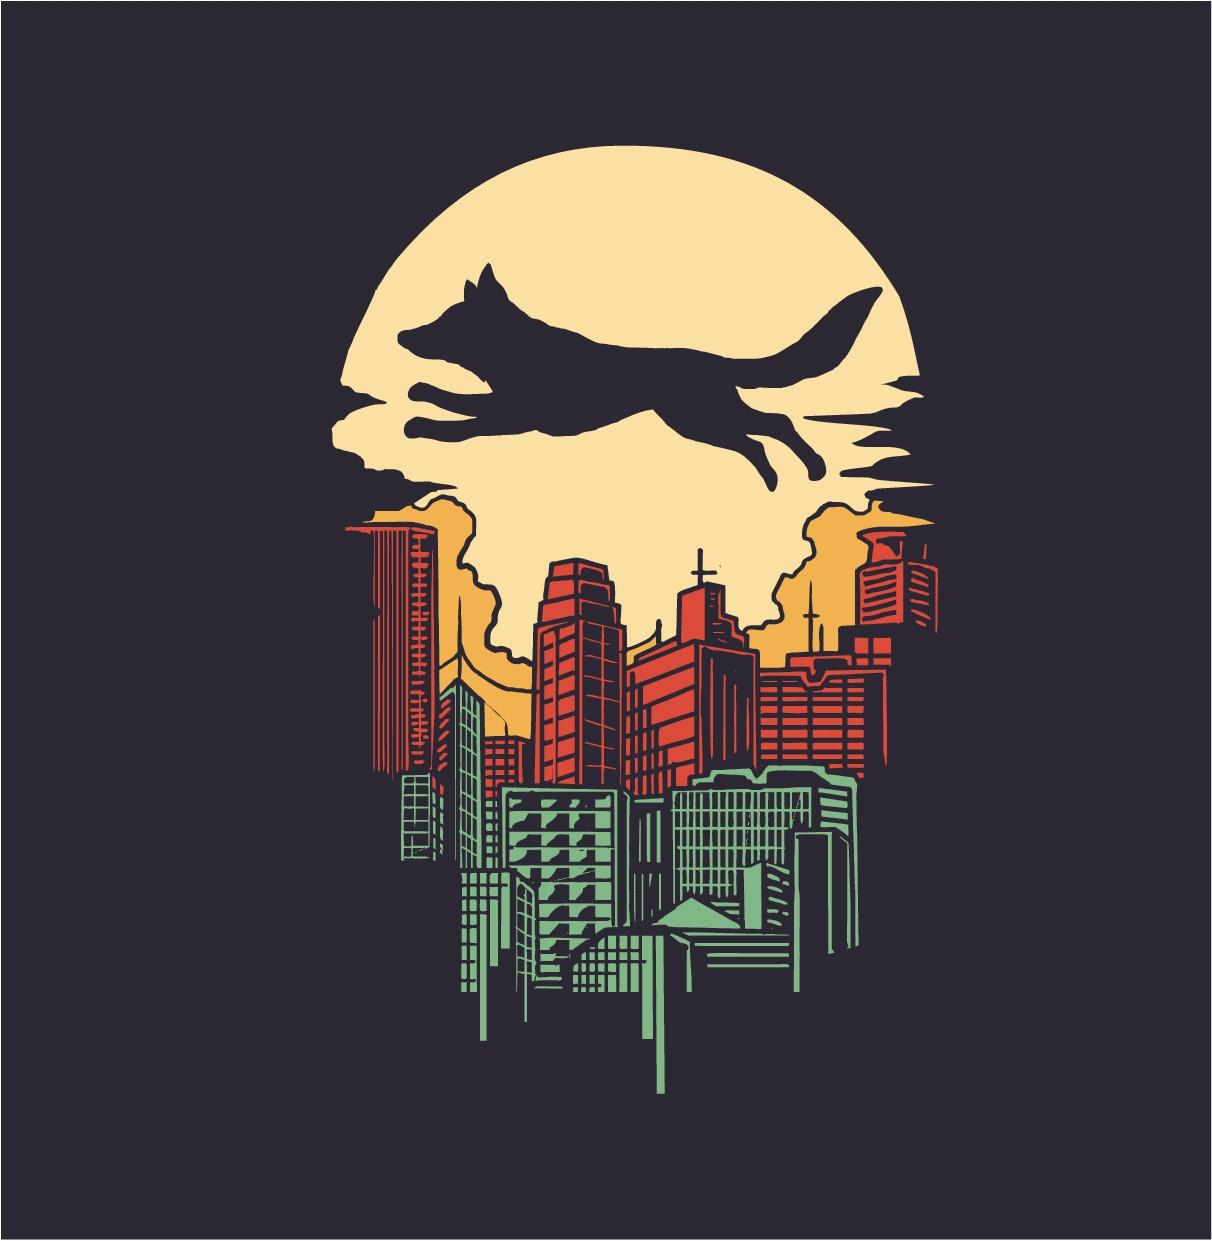 Metro Fox Clothing Co. city themed T-Shirt Design